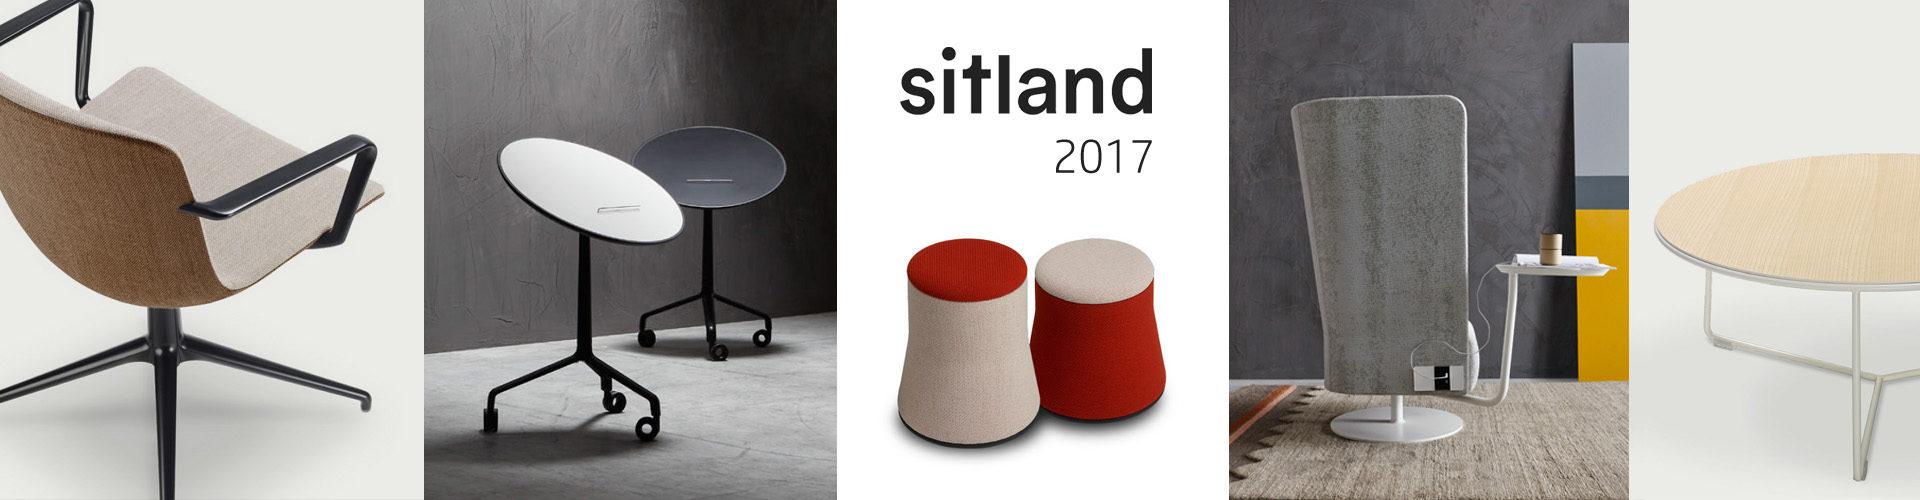 Nové židle Sitland 2017 - slide